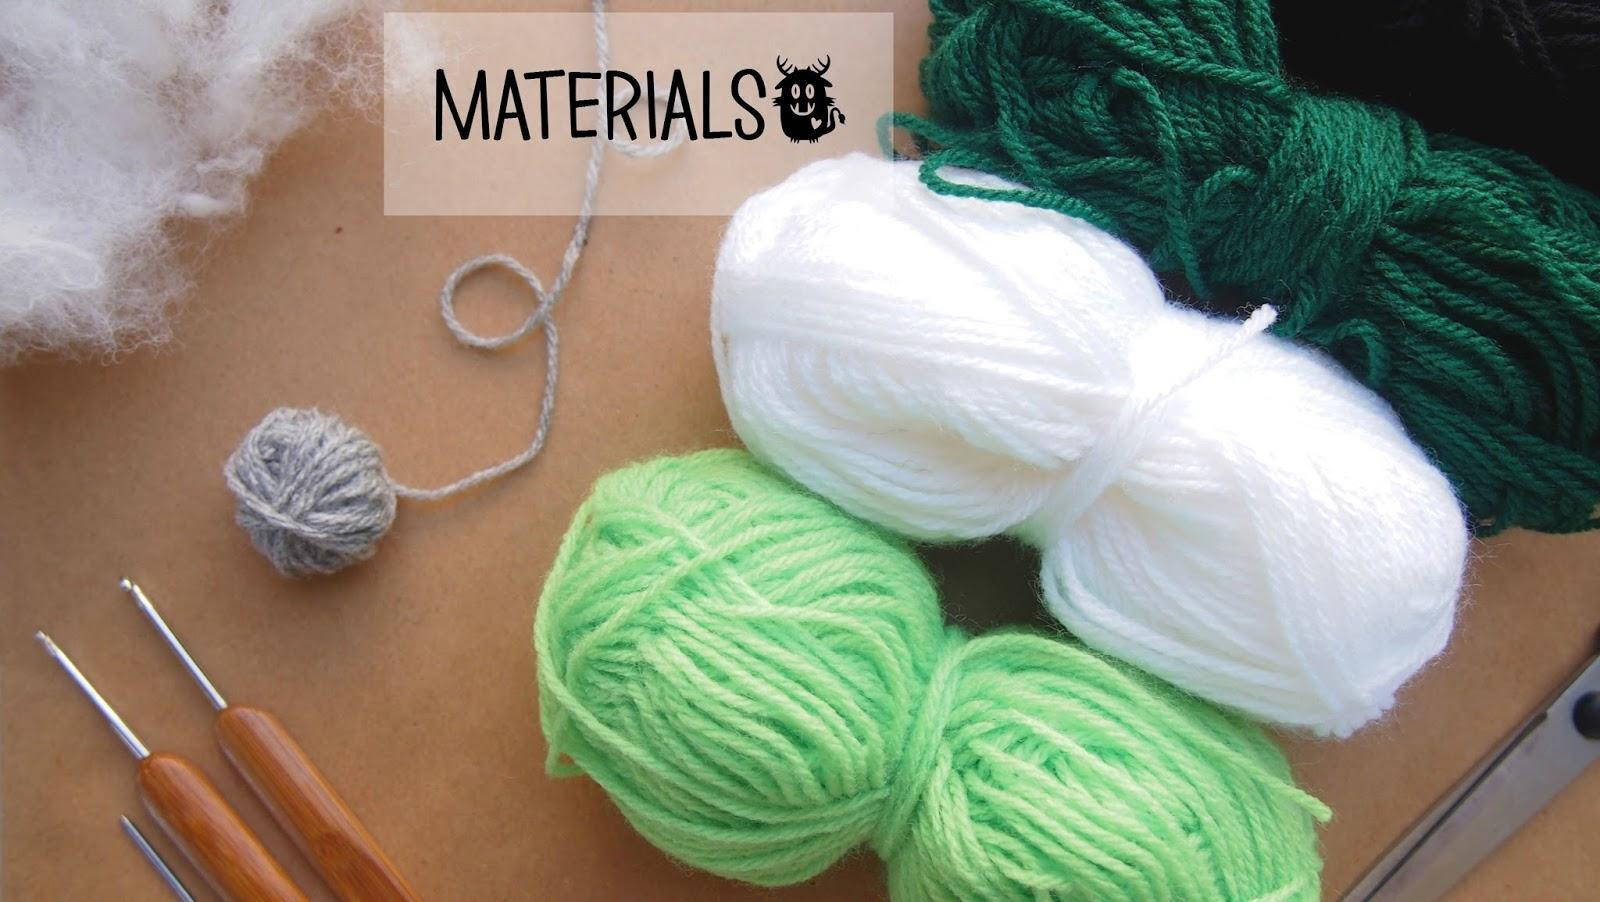 Tsum Tsum Amigurumi Pattern Free : Sol de noche deco crochet mike wazowski crochet tsum tsum free